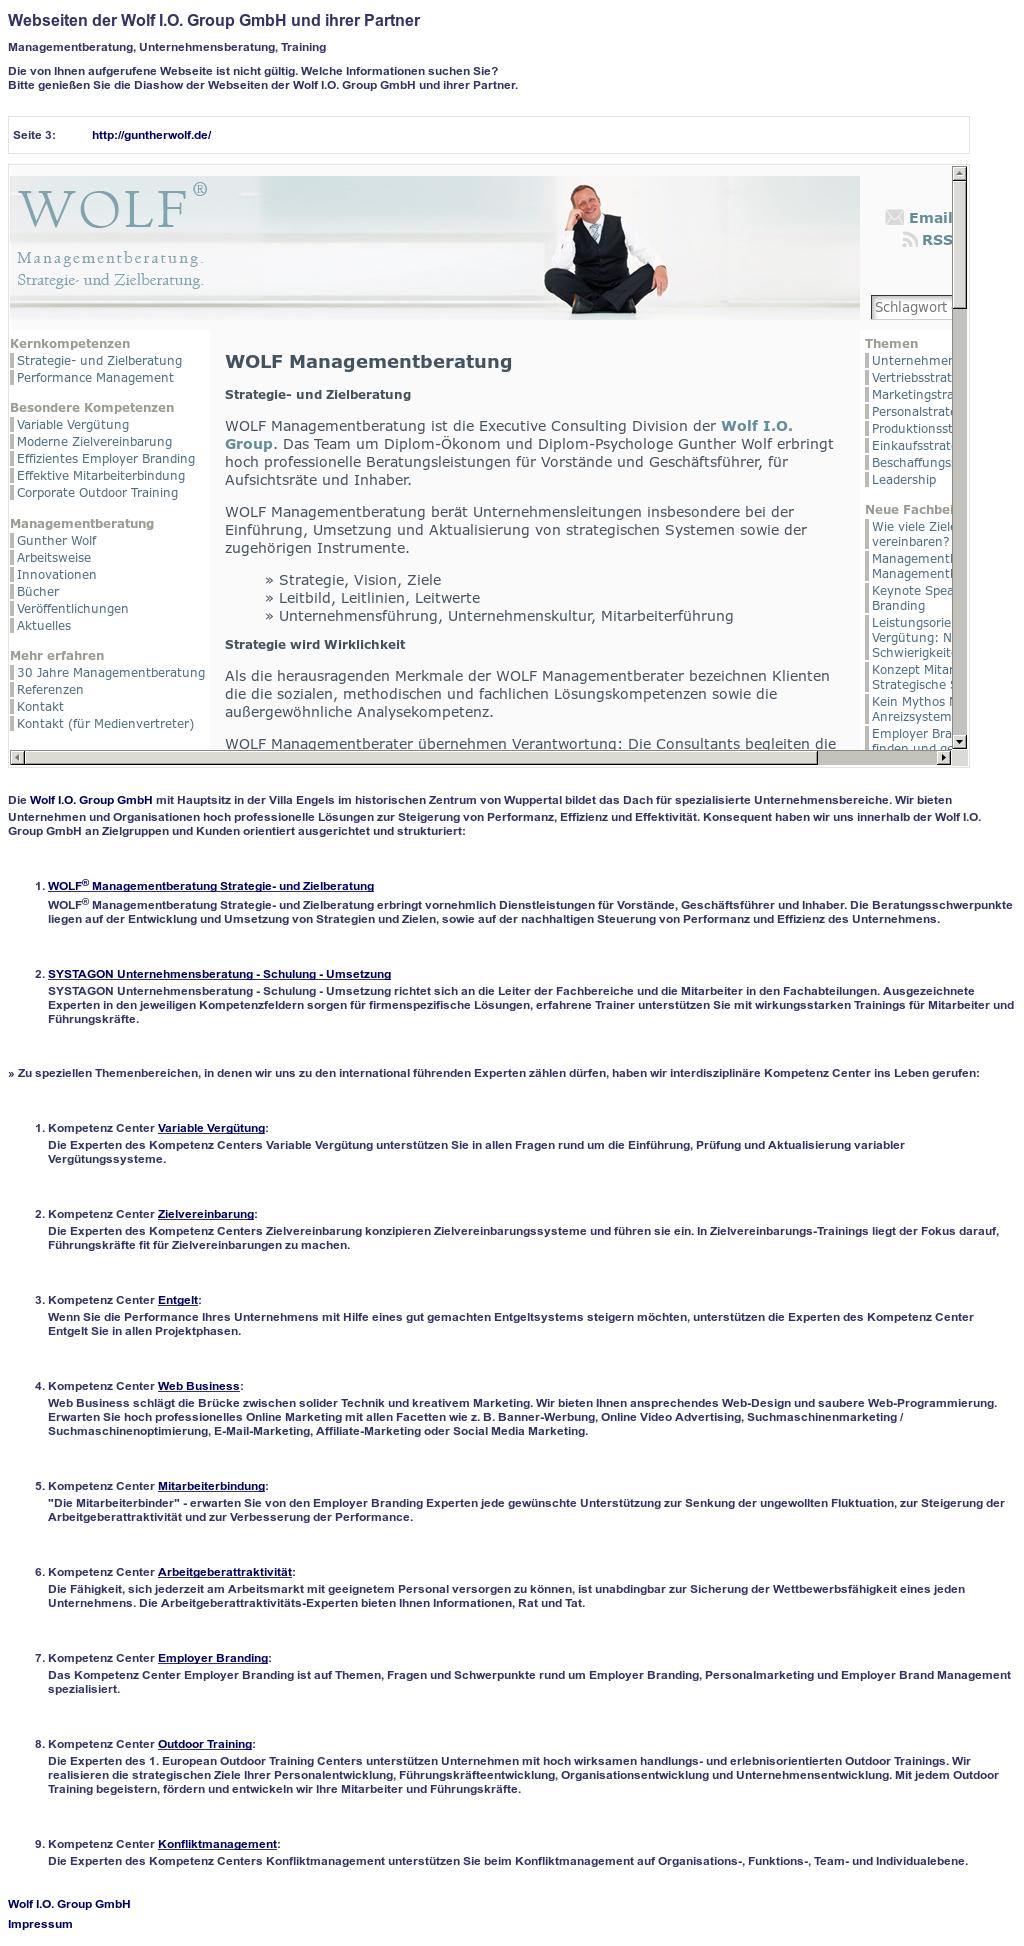 Kaltumformung Competitors, Revenue and Employees - Owler Company Profile